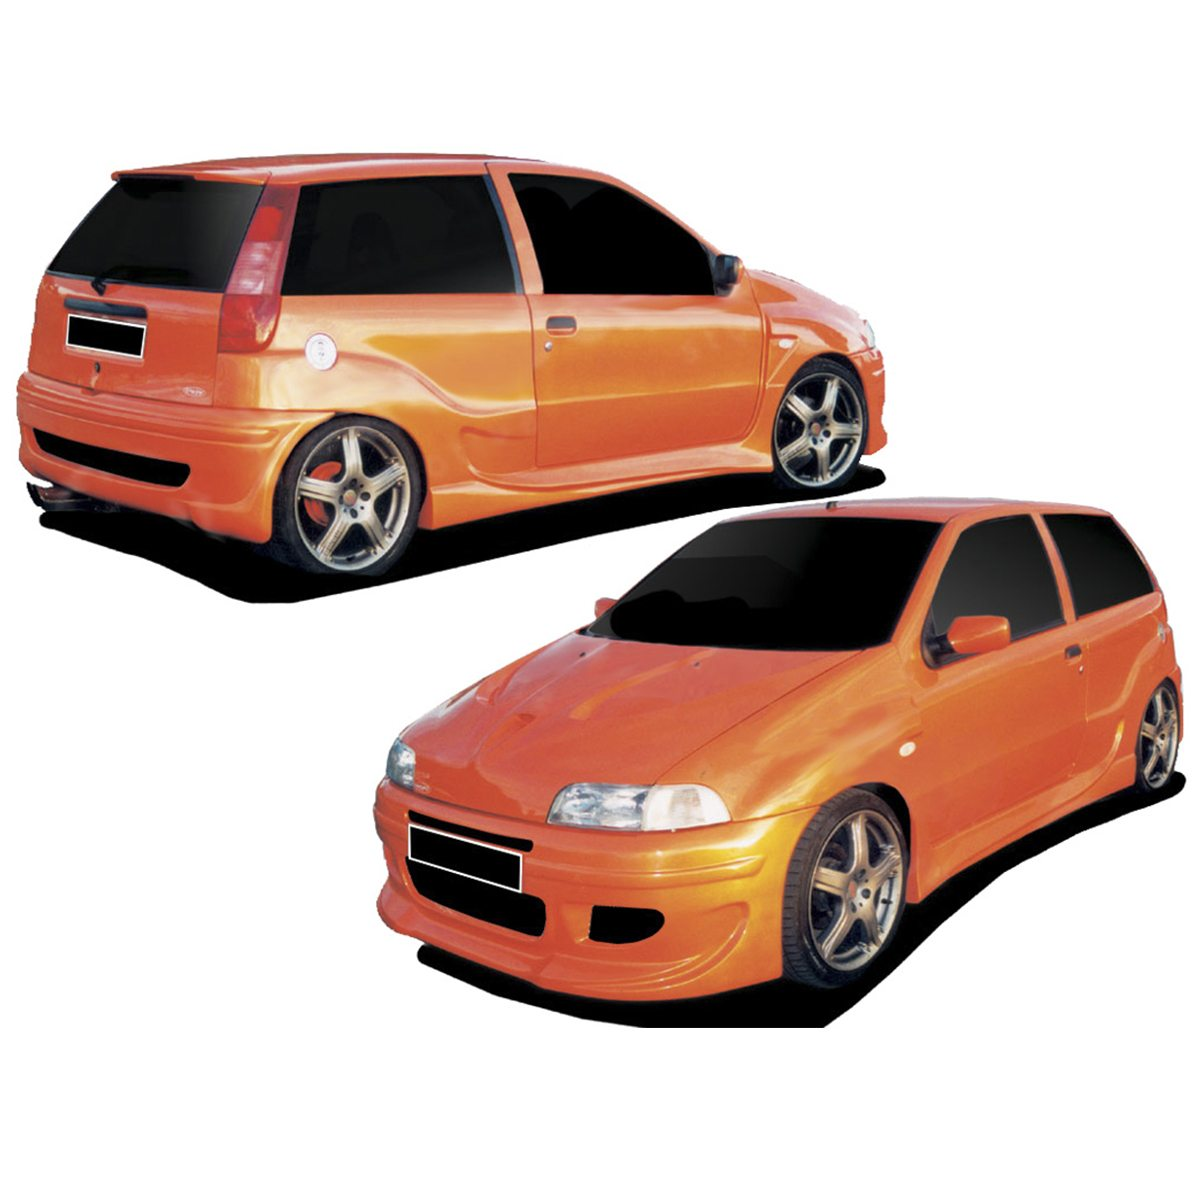 Fiat-Punto-Diablo-Wide-KIT-KTC003